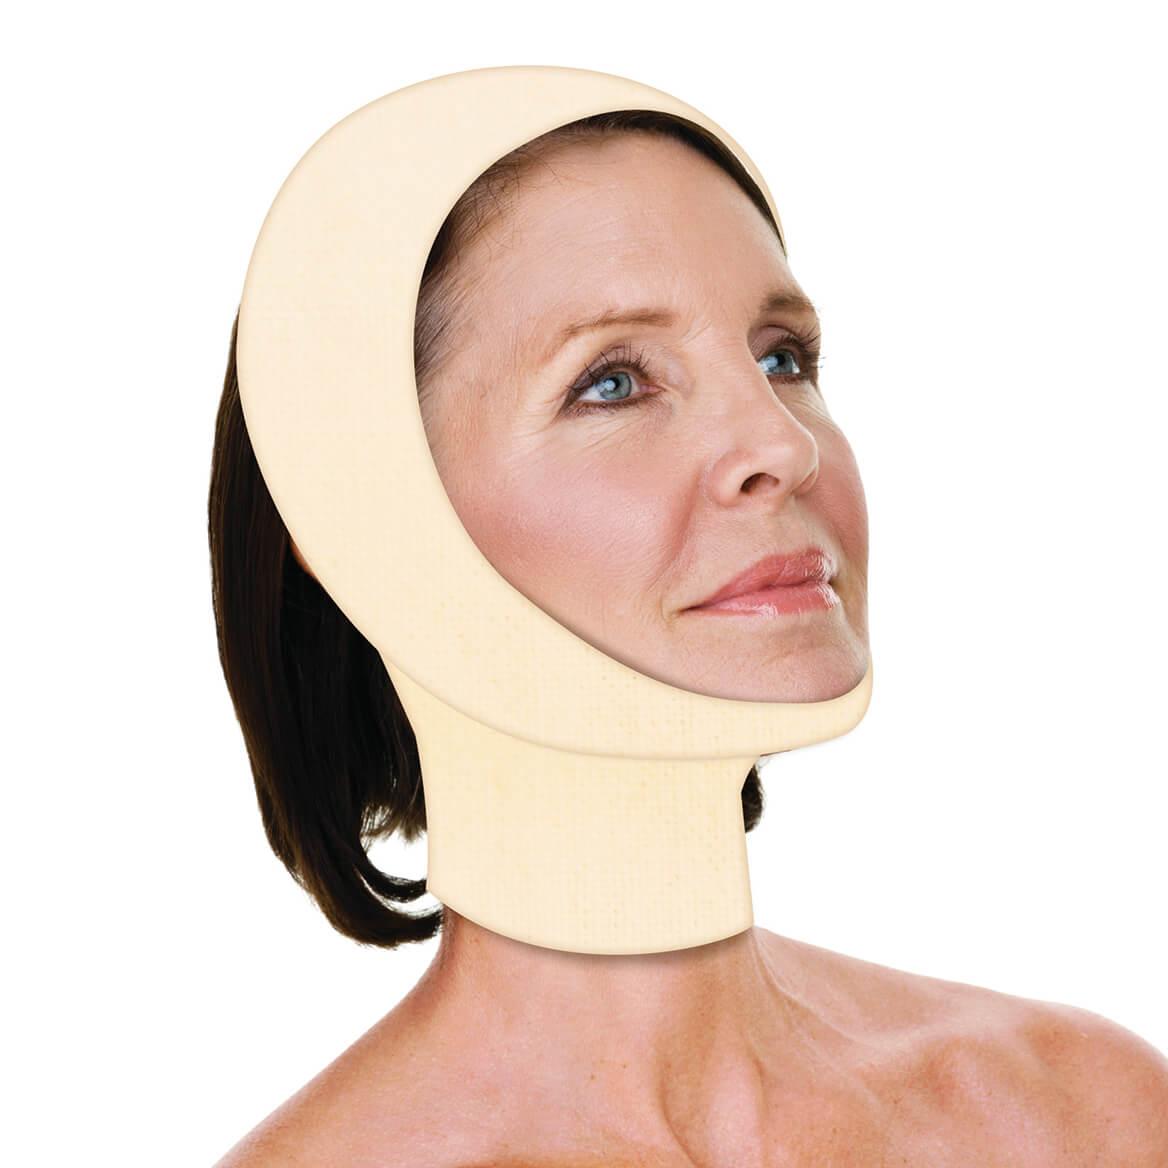 Chin & Neck Transformation Kit-369982